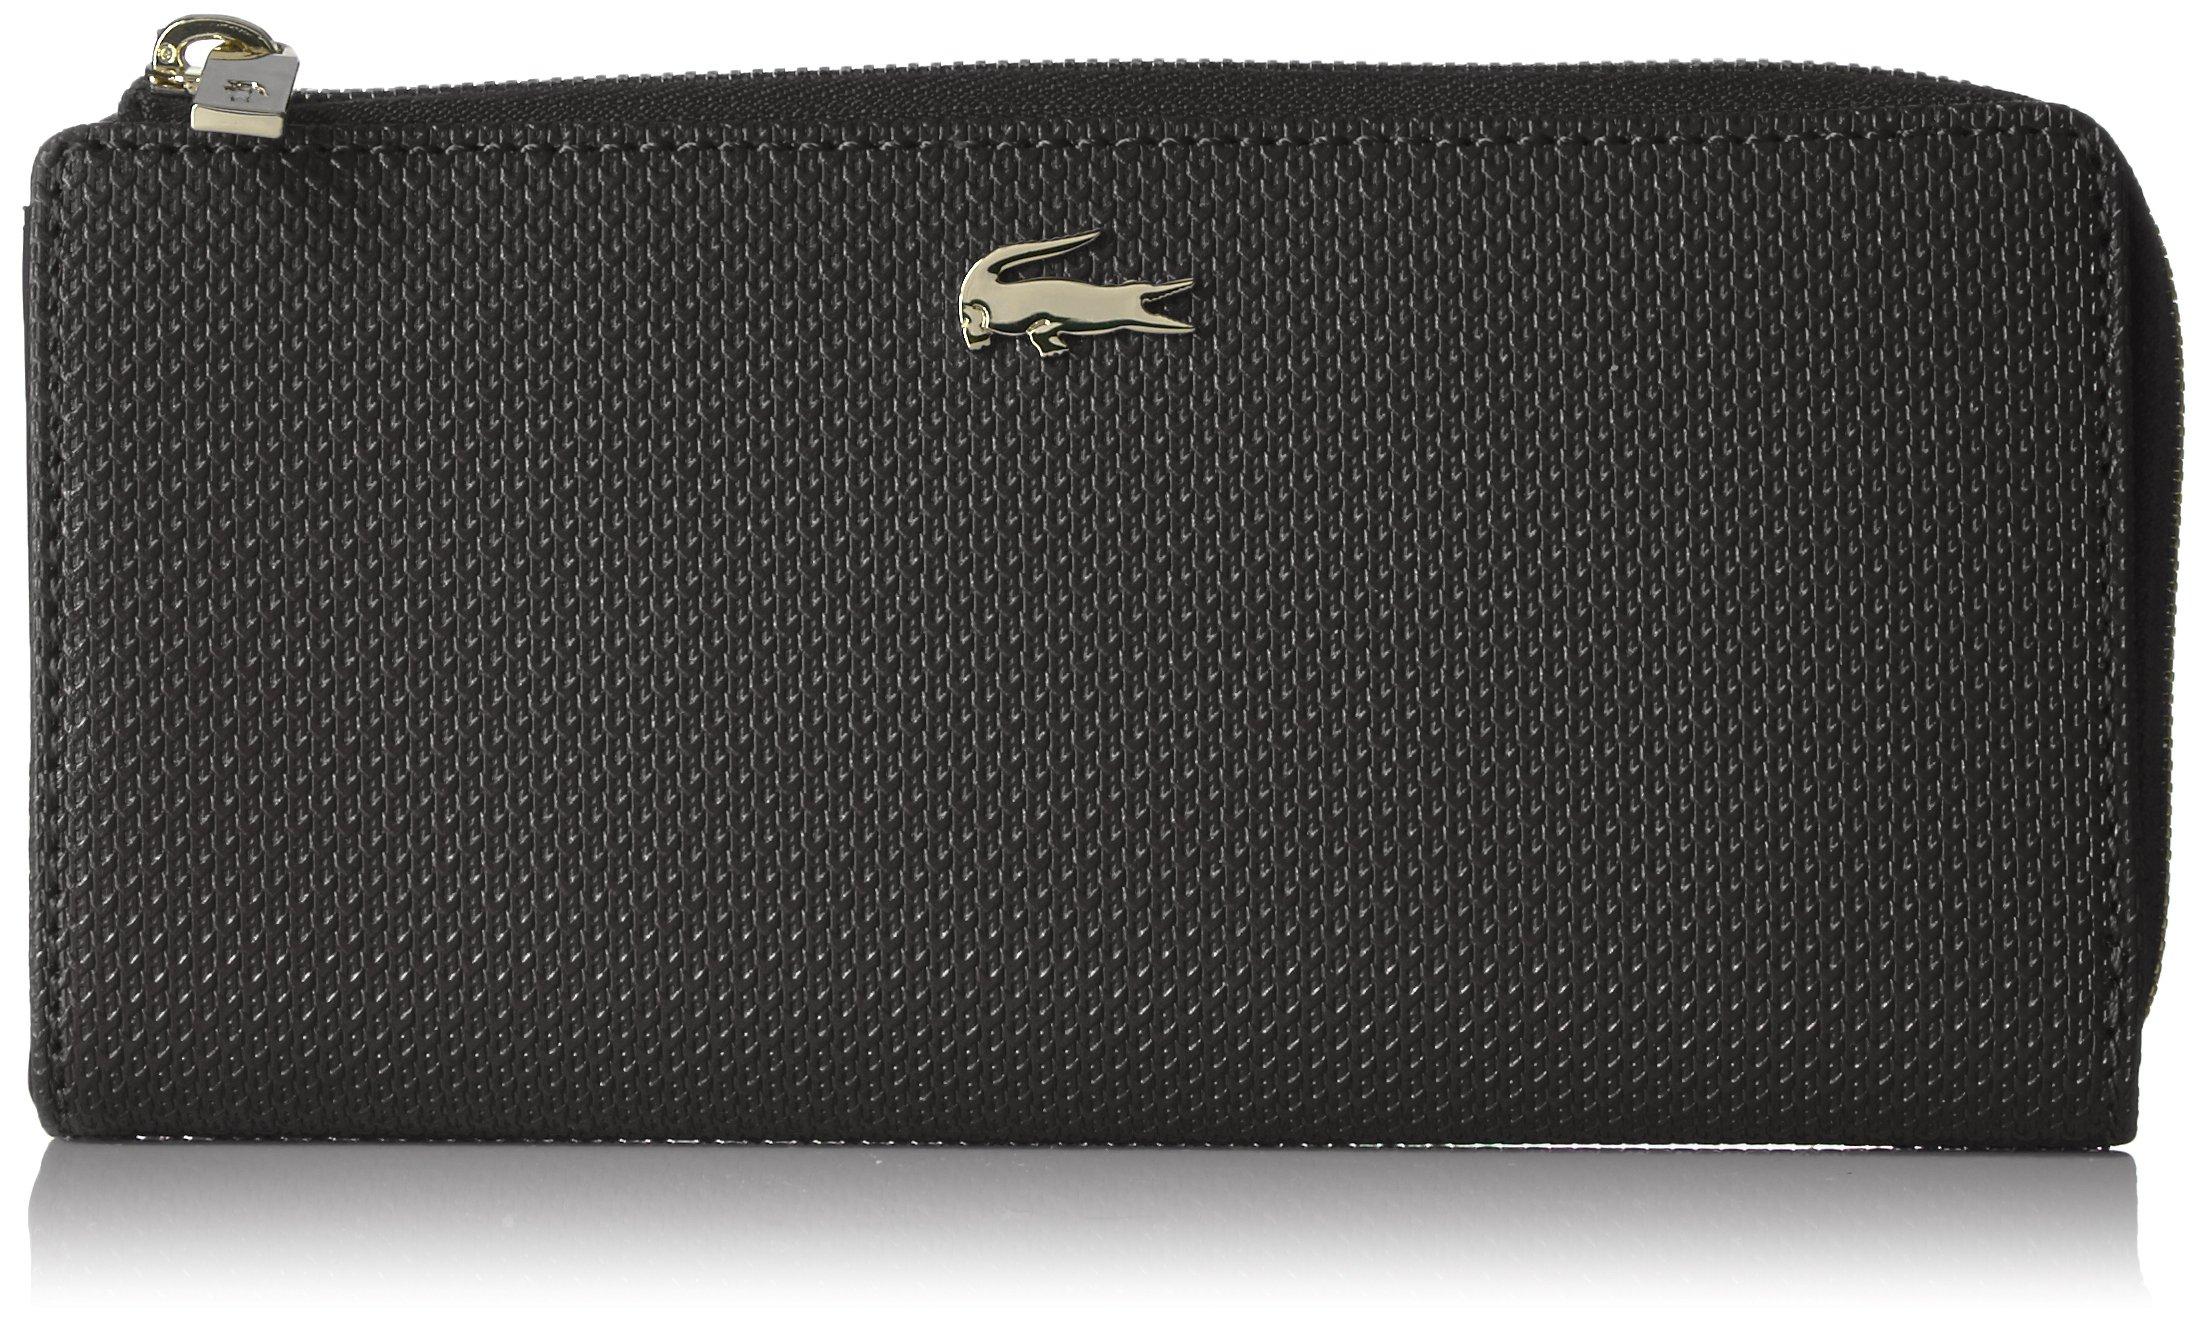 Lacoste Chantaco Slim Zip Wallet Wallet